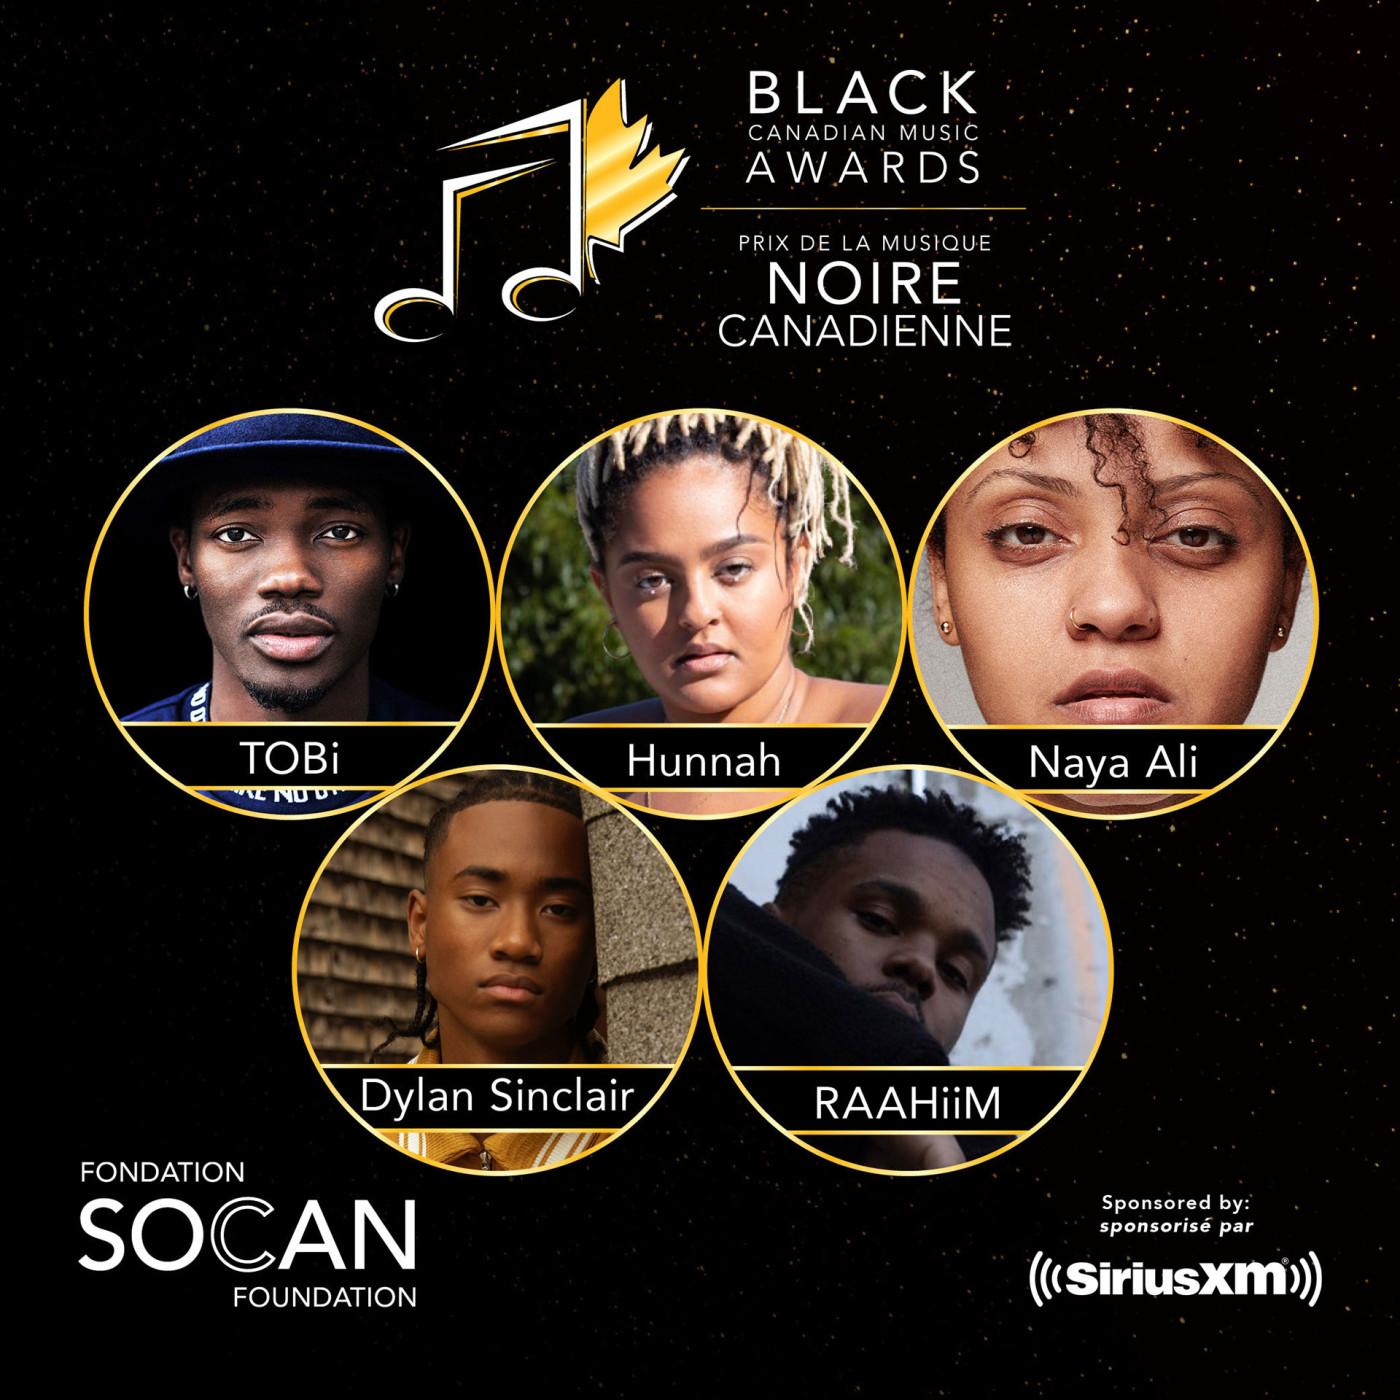 black-canadian-music-awards